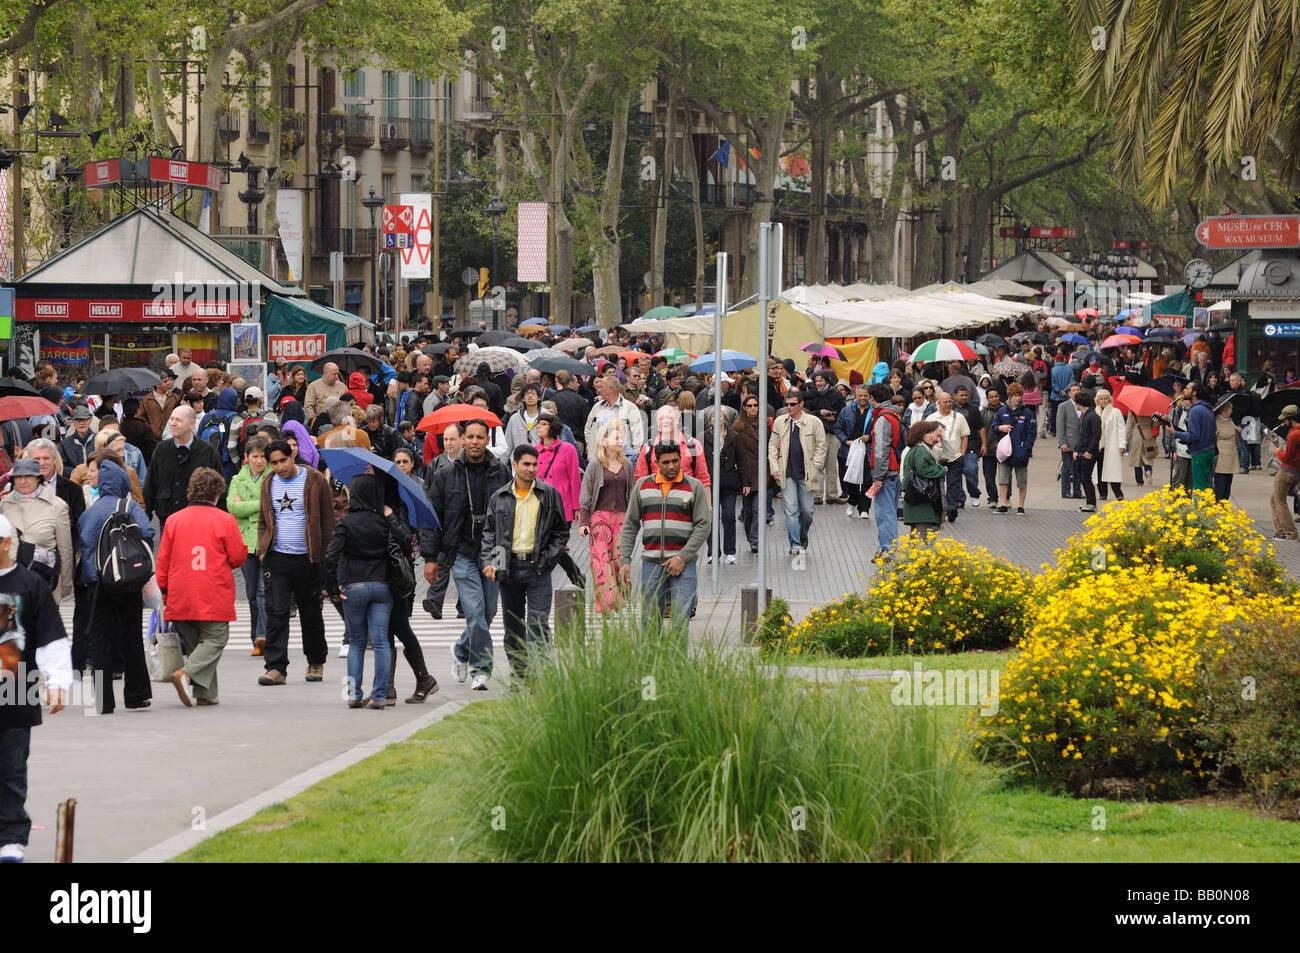 People walking at La Rambla in Barcelona Spain - Stock Image